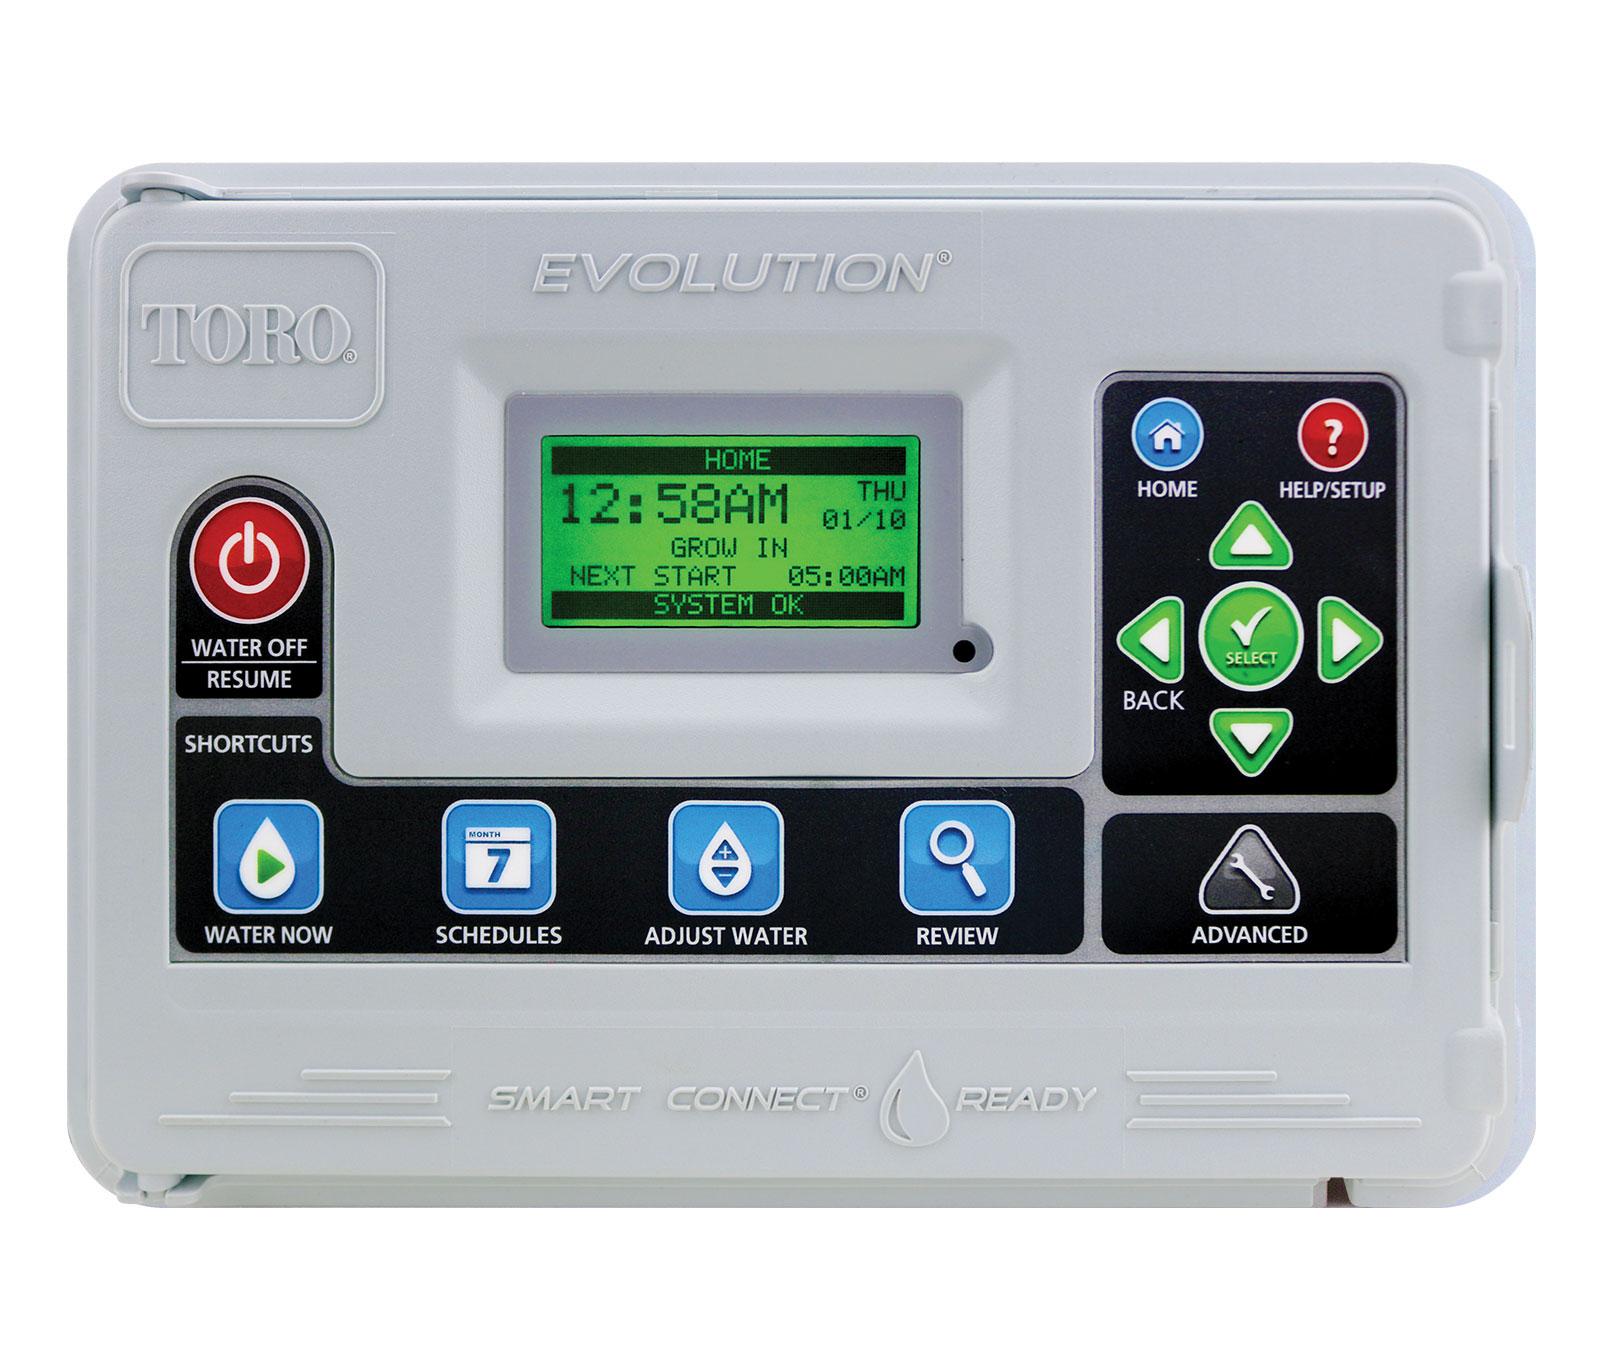 toro evolution series controller rh toro com toro ecxtra sprinkler system manual toro greenkeeper sprinkler system manual